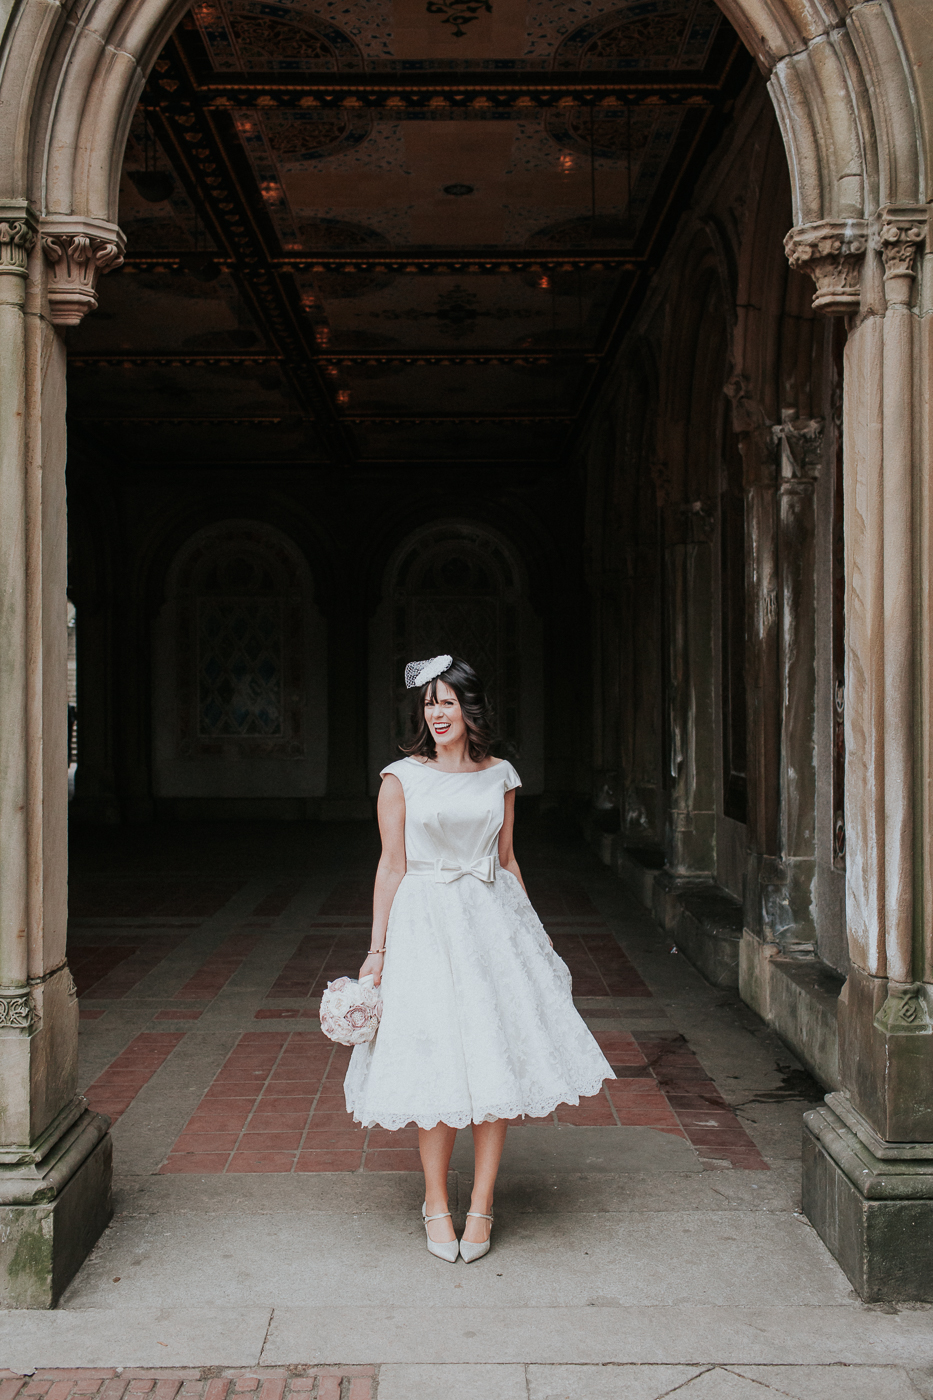 Ladies-Pavilion-Central-Park-NYC-Documentary-Elopement-Wedding-Photographer-56.jpg